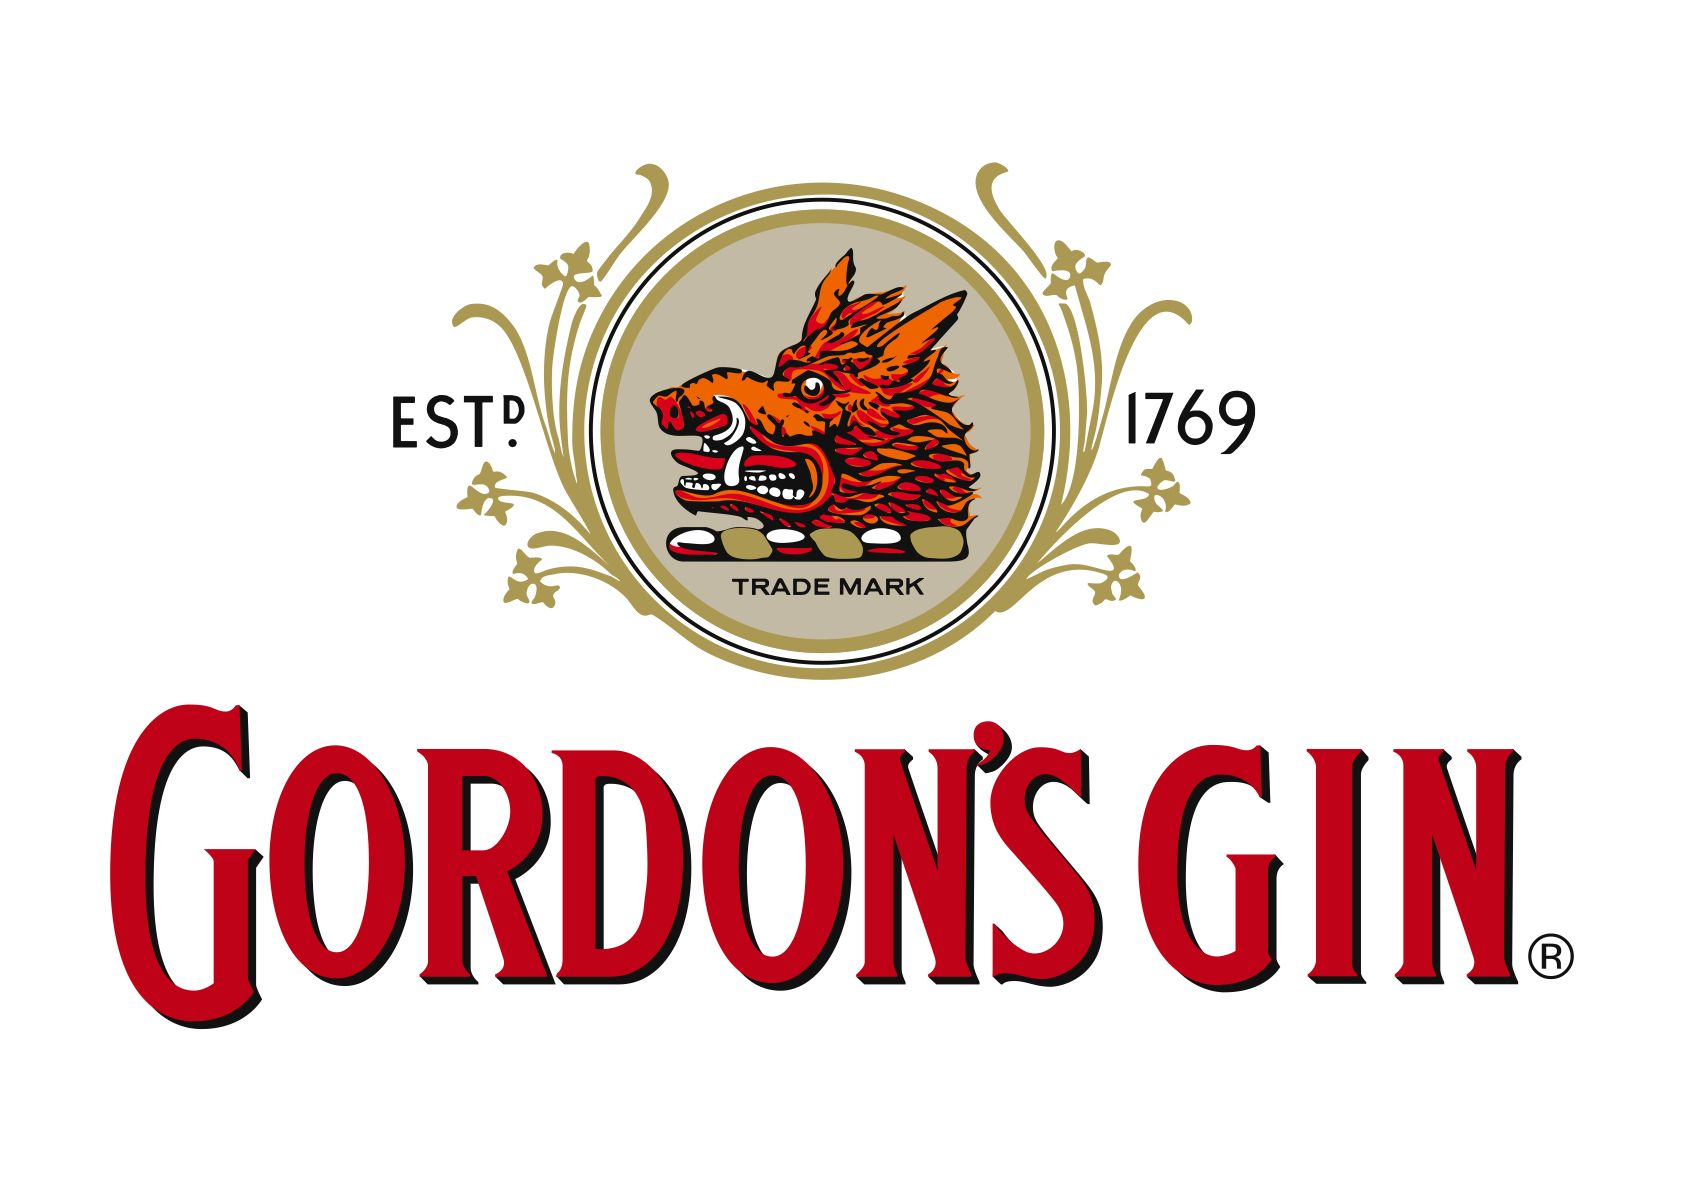 Http Redcarpetconcepts Co Za Wp Content Uploads 2012 01 Gordons Gin Logos Jpg Gordon S Gin Gin Picture Logo